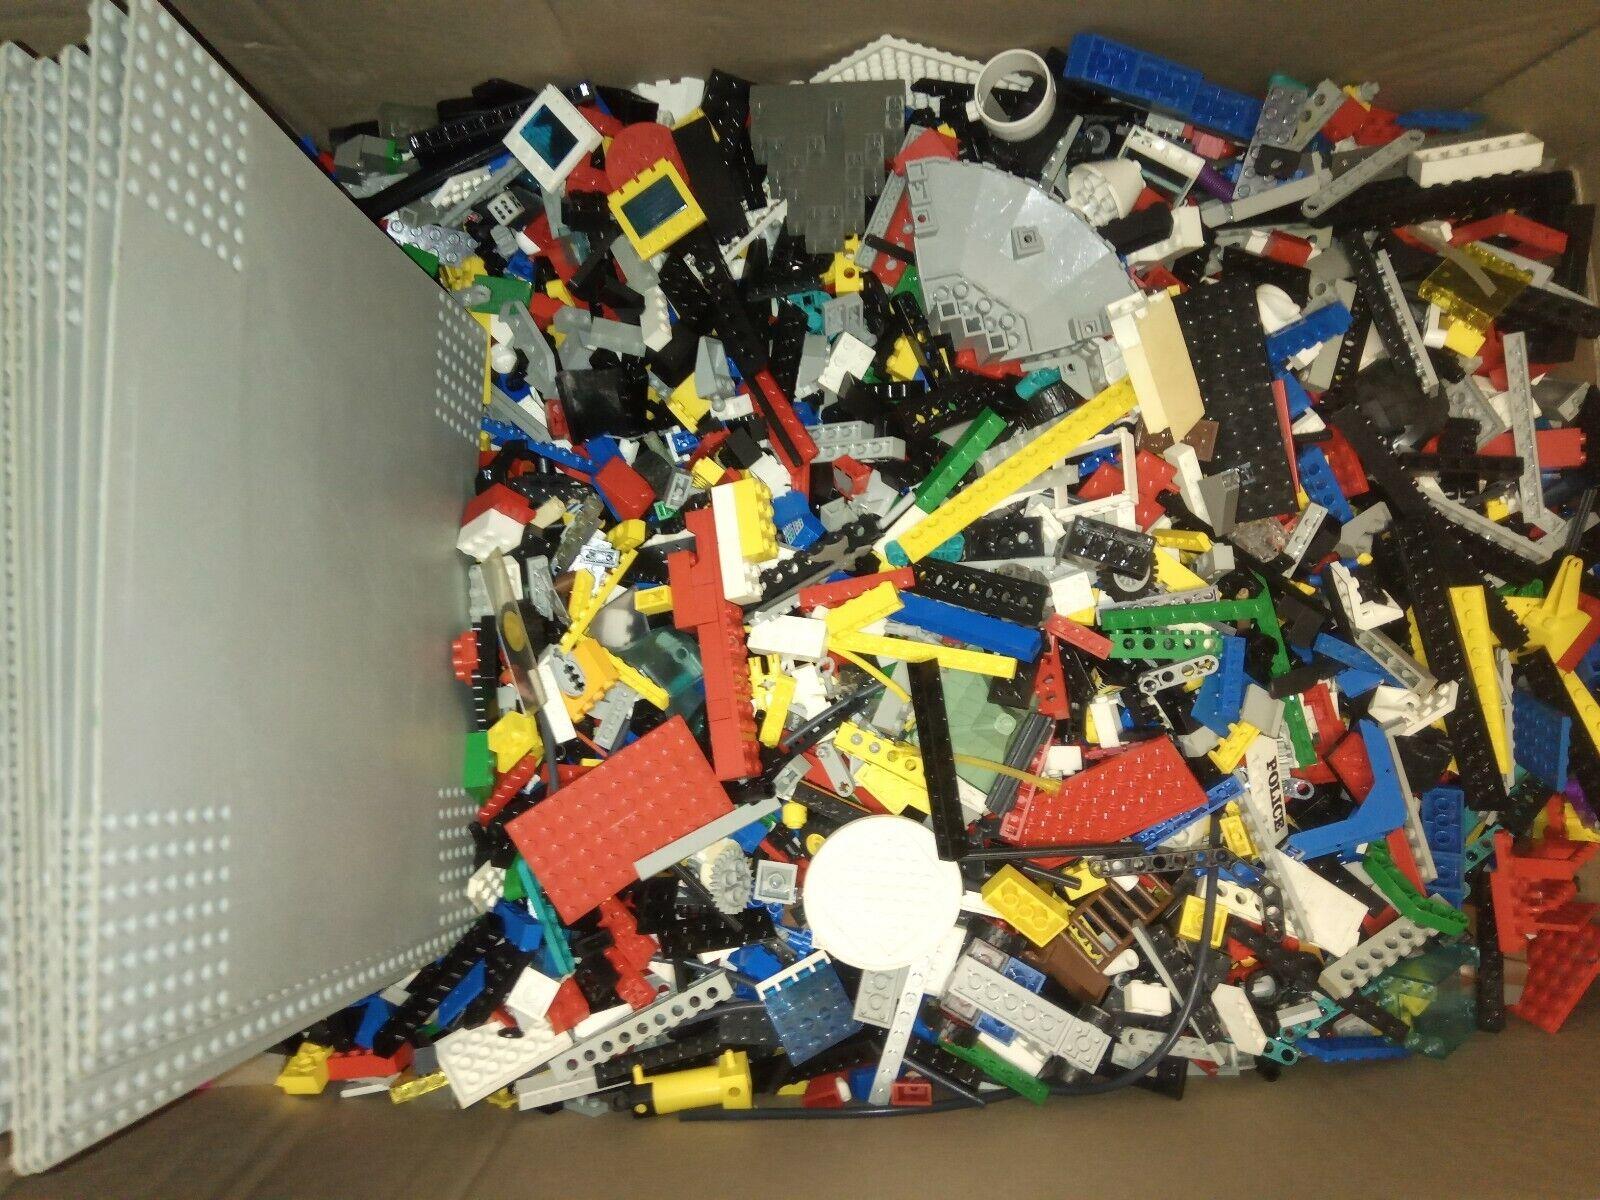 Lego Technik Lego City Lego Burg aus den letzten 20 Jahren